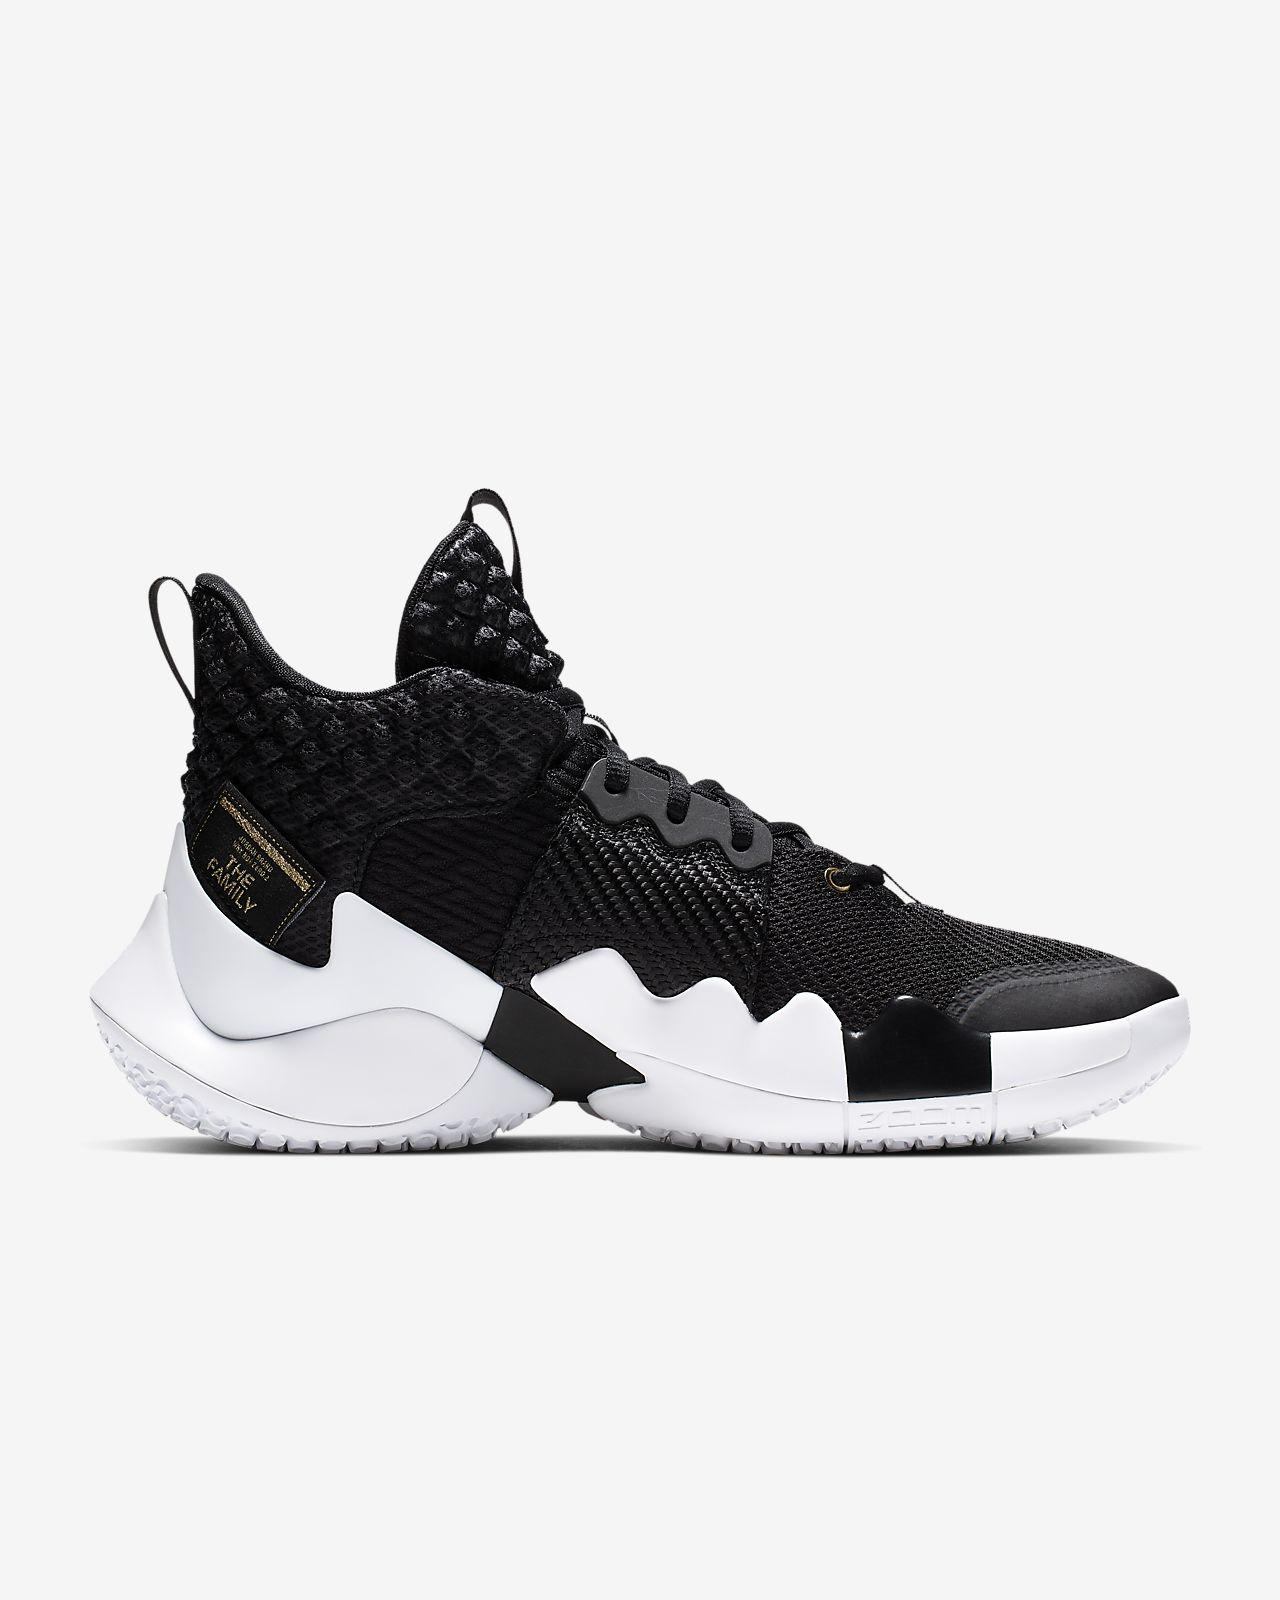 f31bcfae675 Zer0.2 Basketball Shoe Jordan